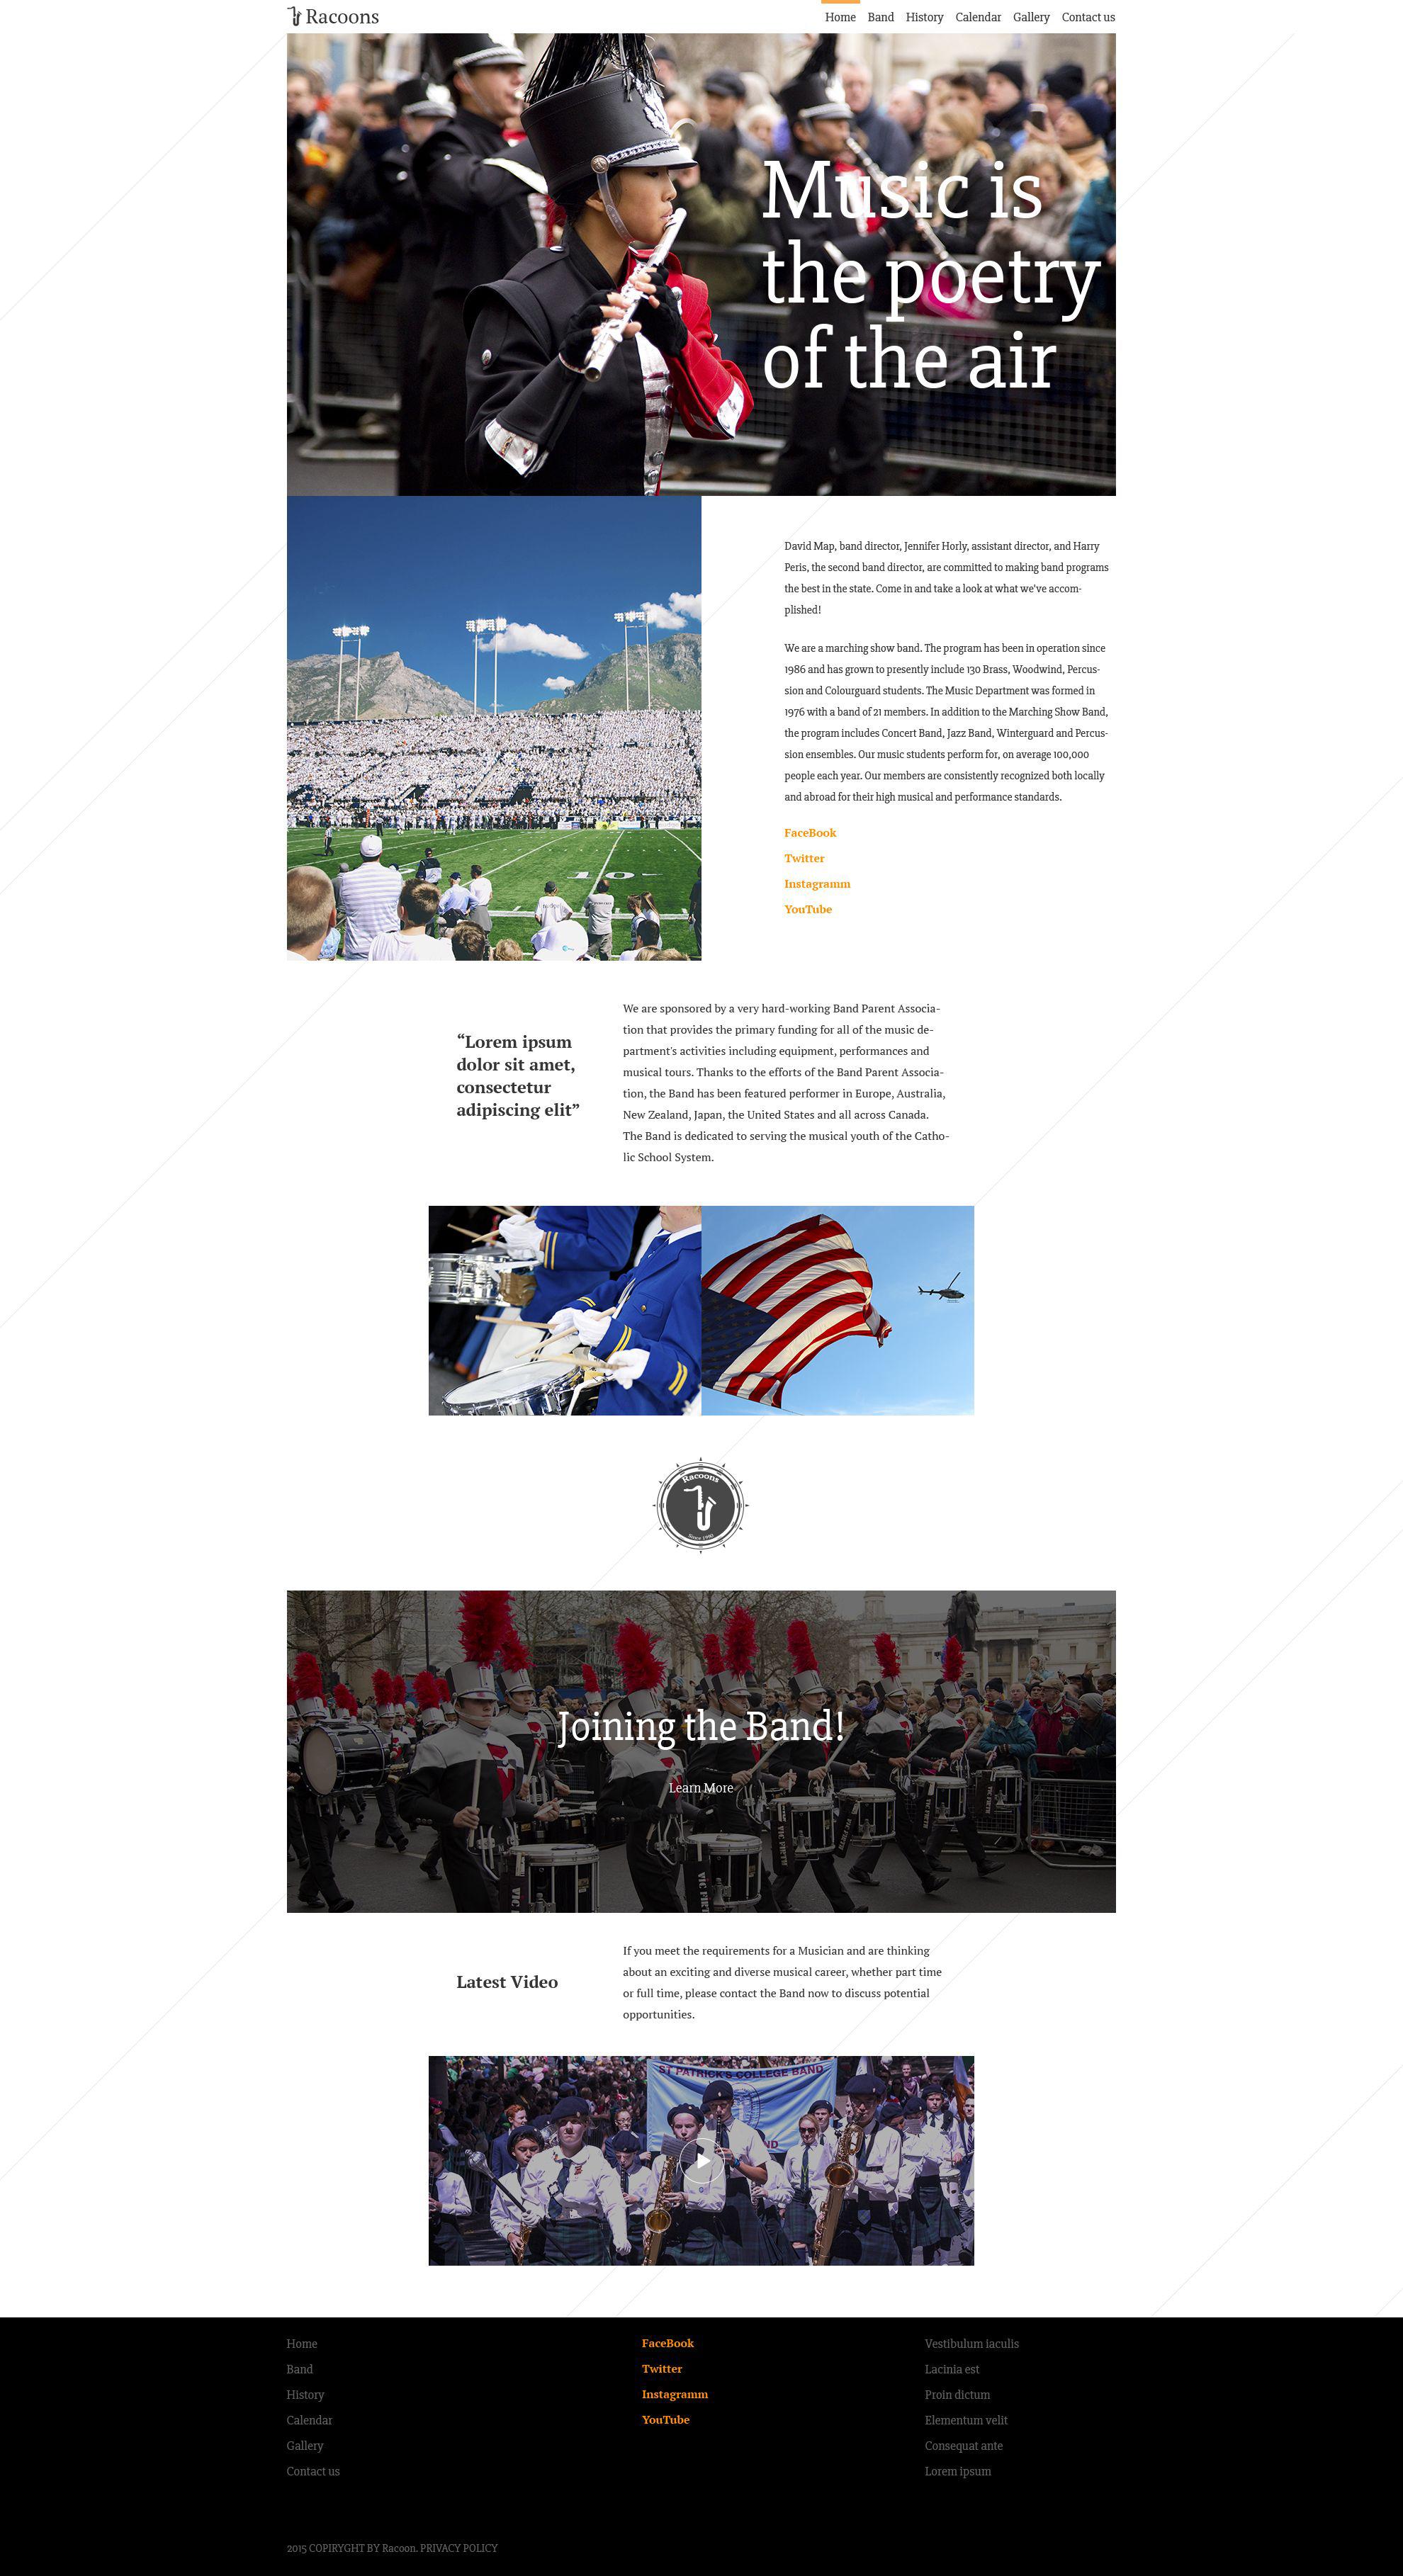 Racoons Website Template